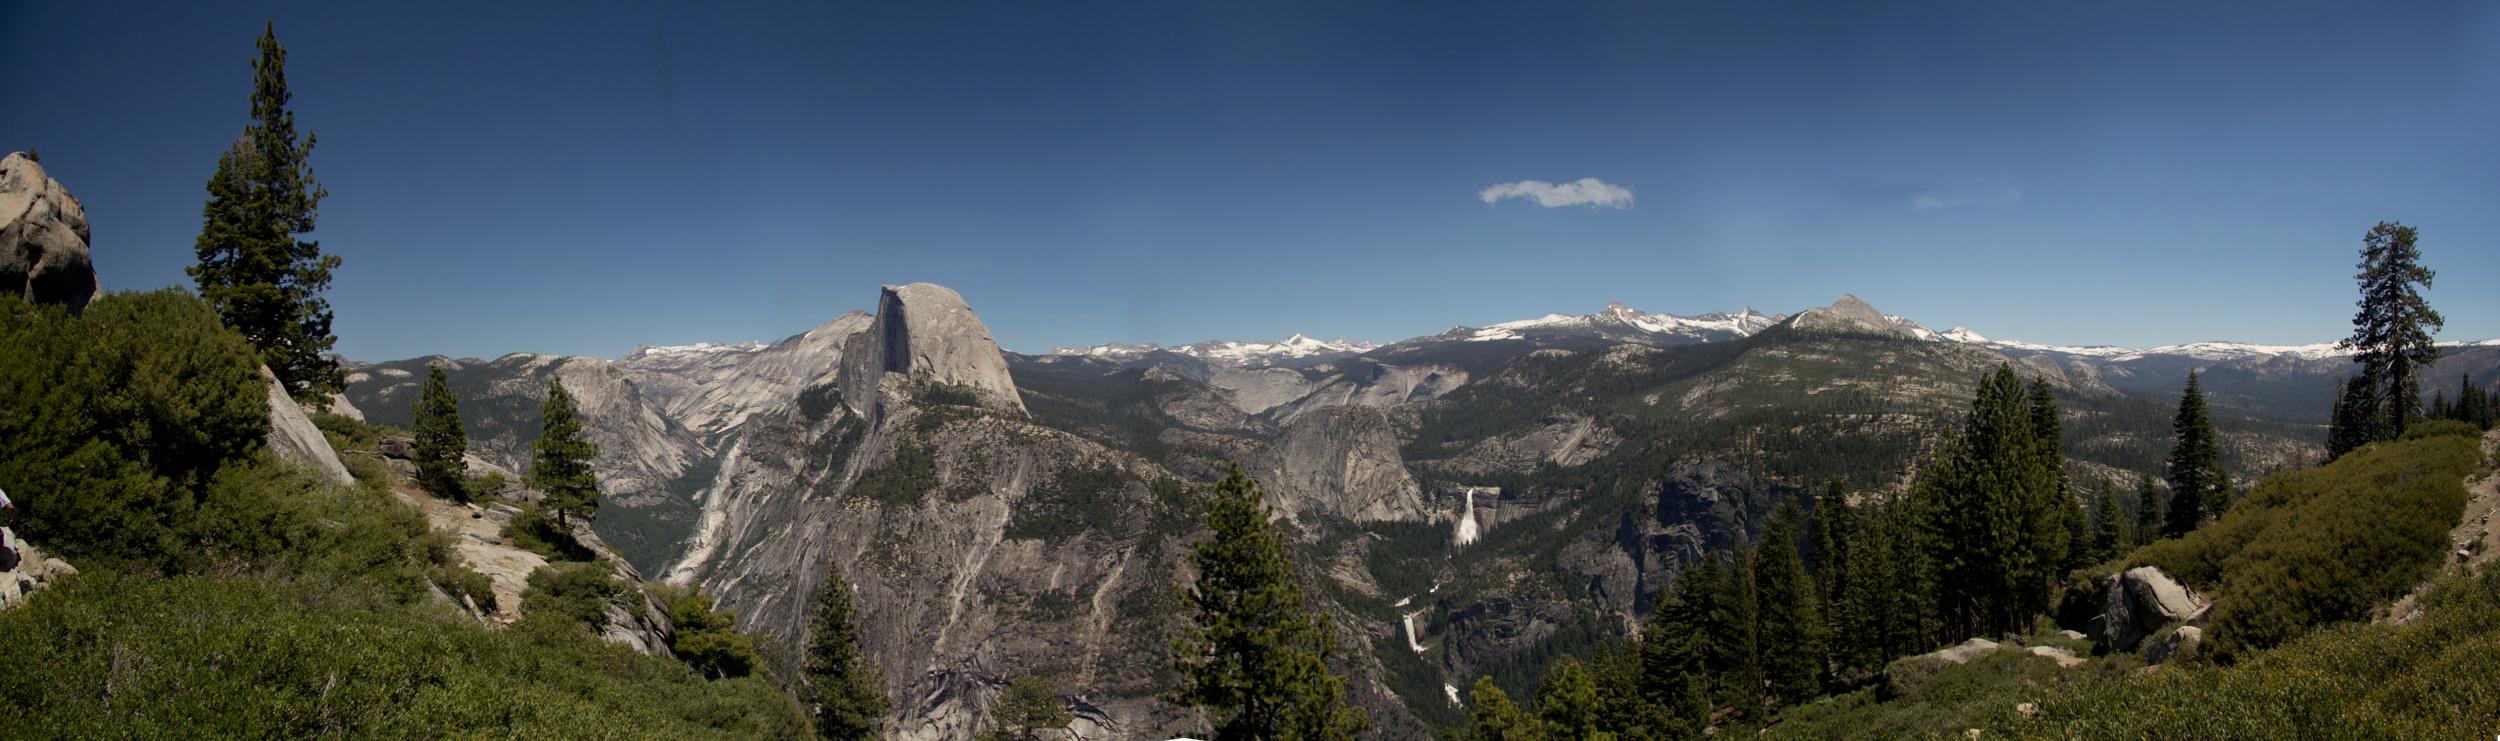 Half Dome, Yosemite N.P., USA